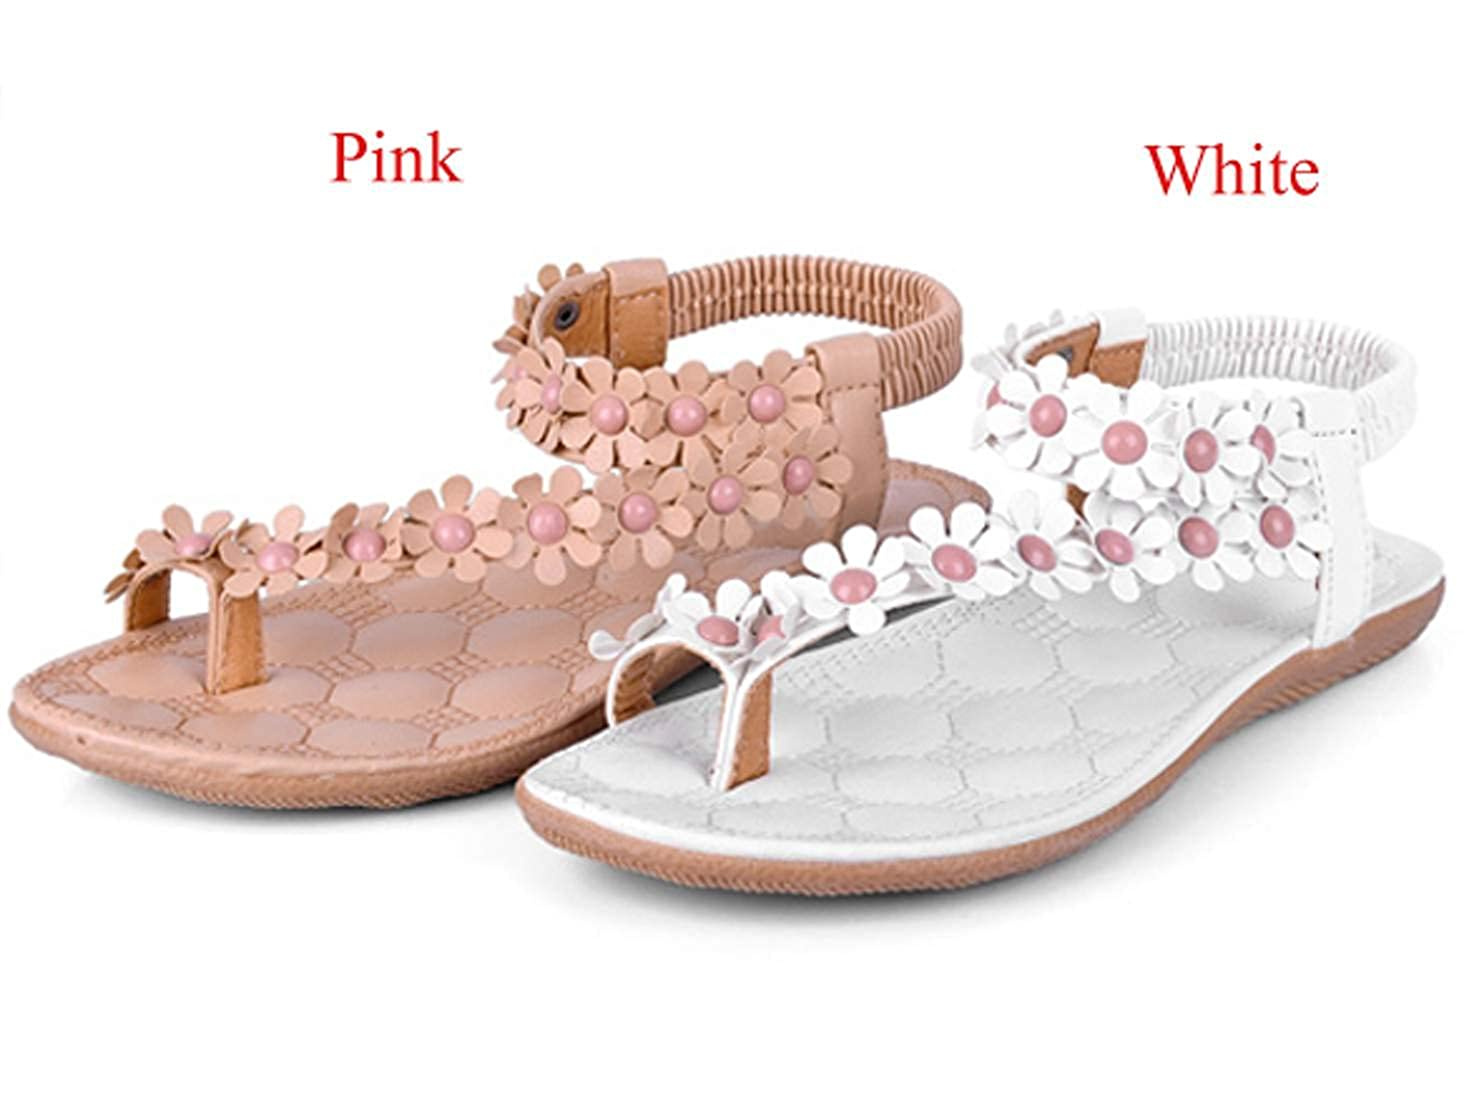 504d9134c2cd Zeagoo Women Bohemia Flower Beads Flip-flop Shoes Flat Sandals - White -   Amazon.co.uk  Clothing